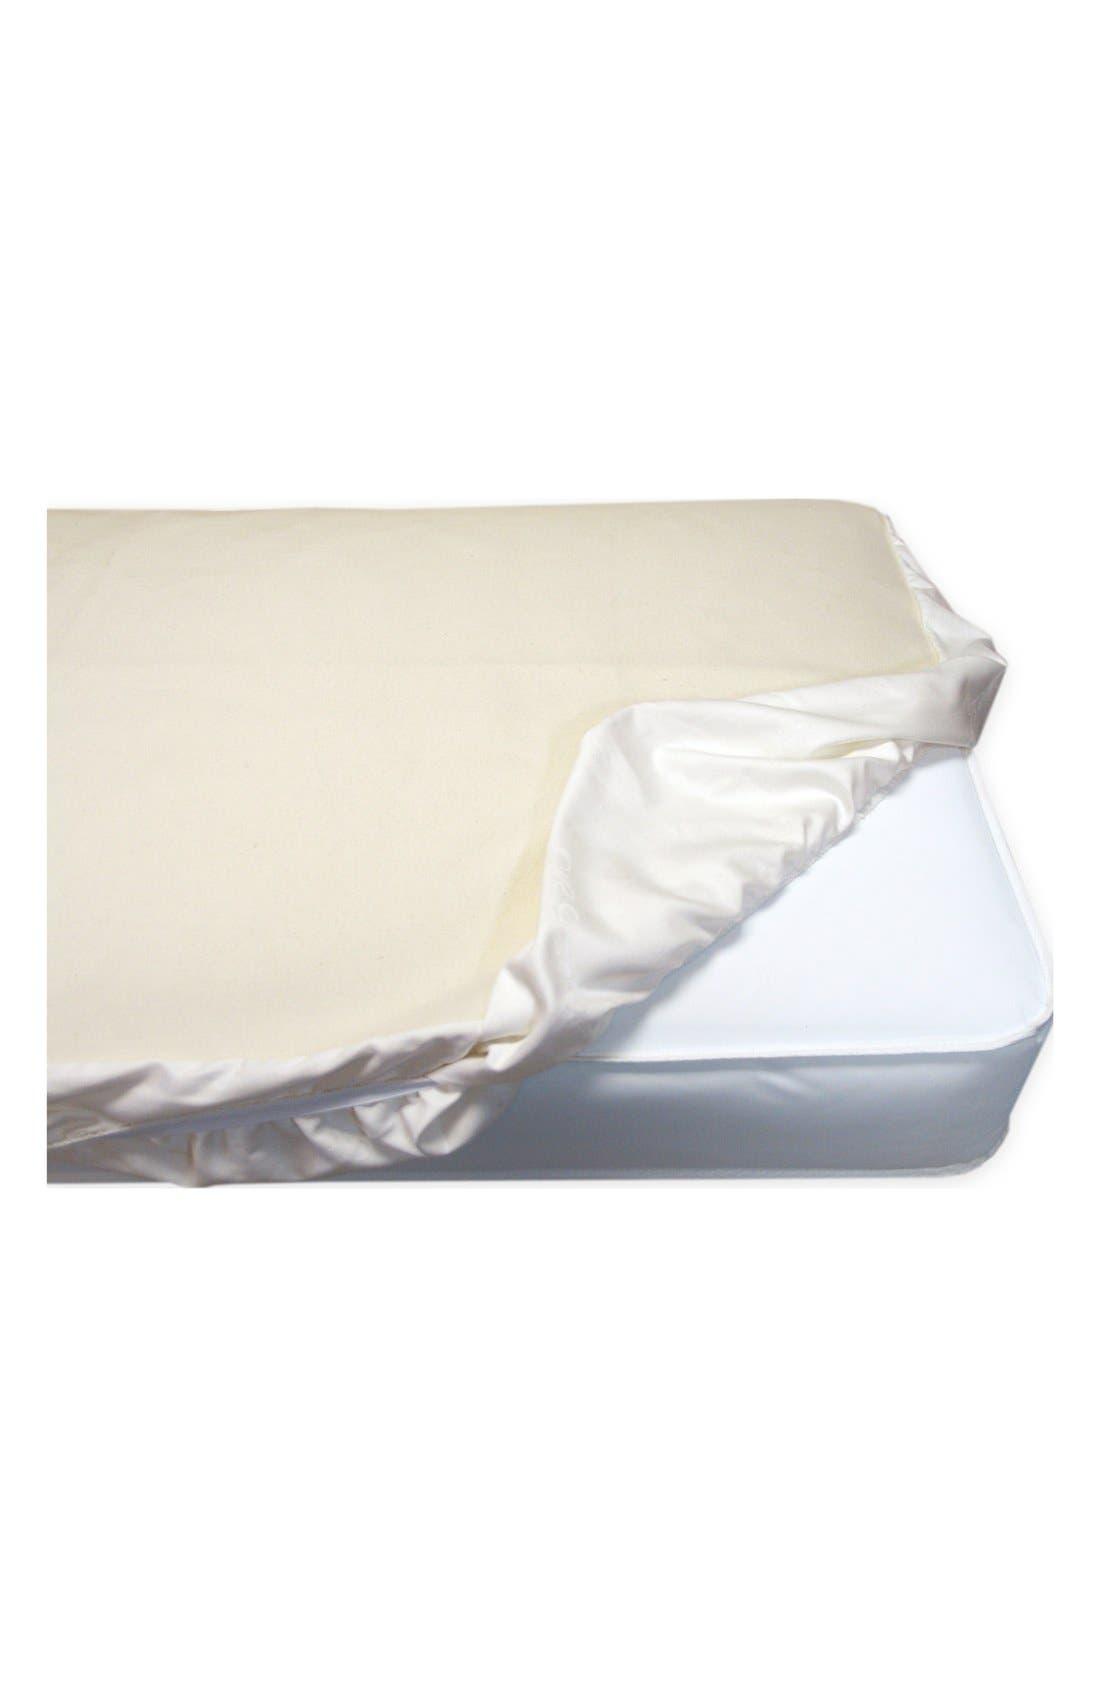 Main Image - Naturepedic Organic Cotton Waterproof Fitted Crib Protector Pad